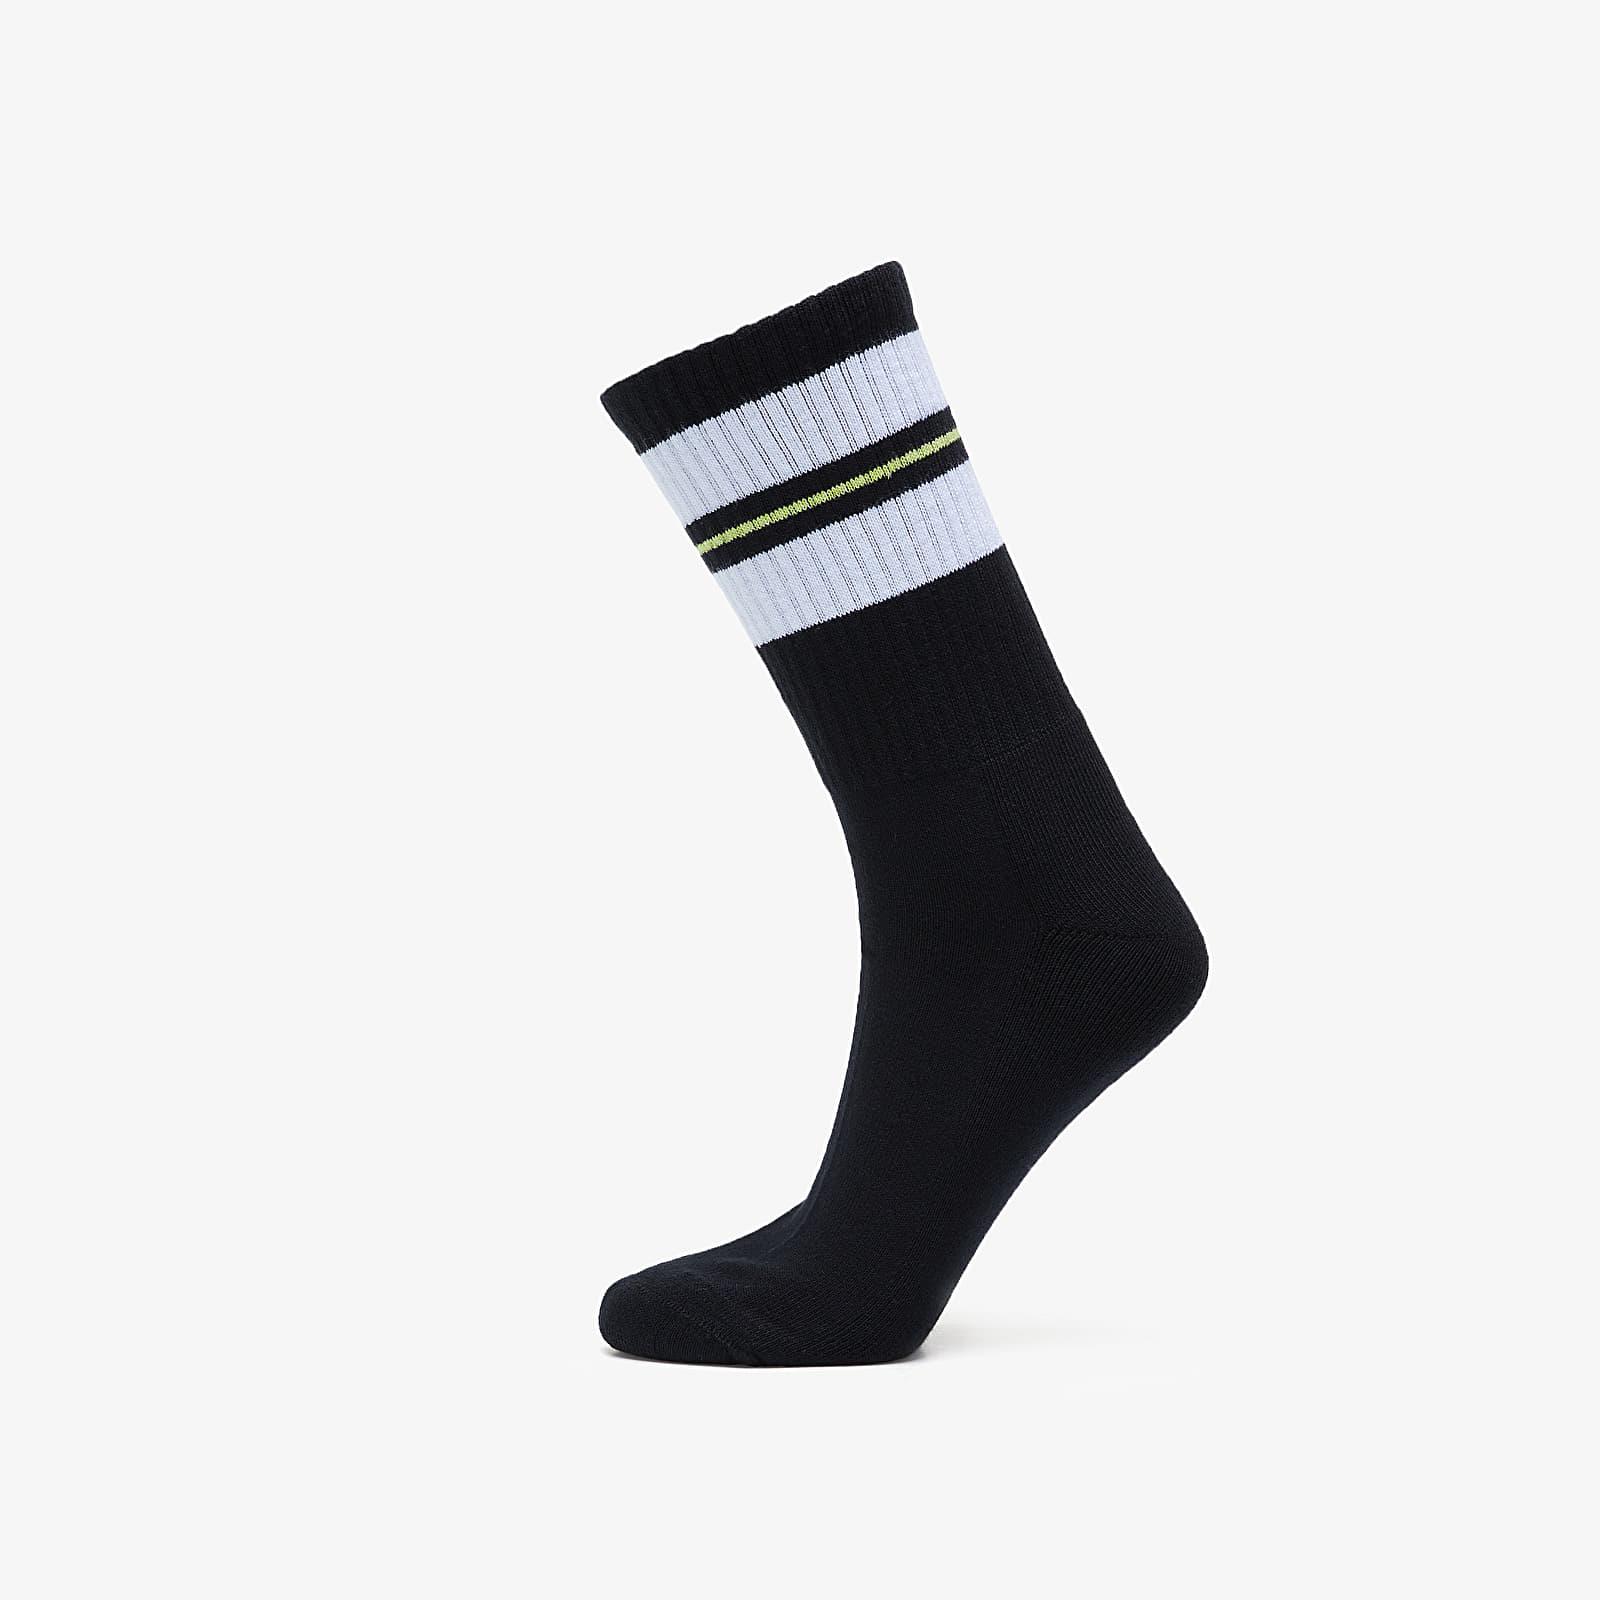 Носки Carhartt WIP Norwood Socks Black/ White/ Lime